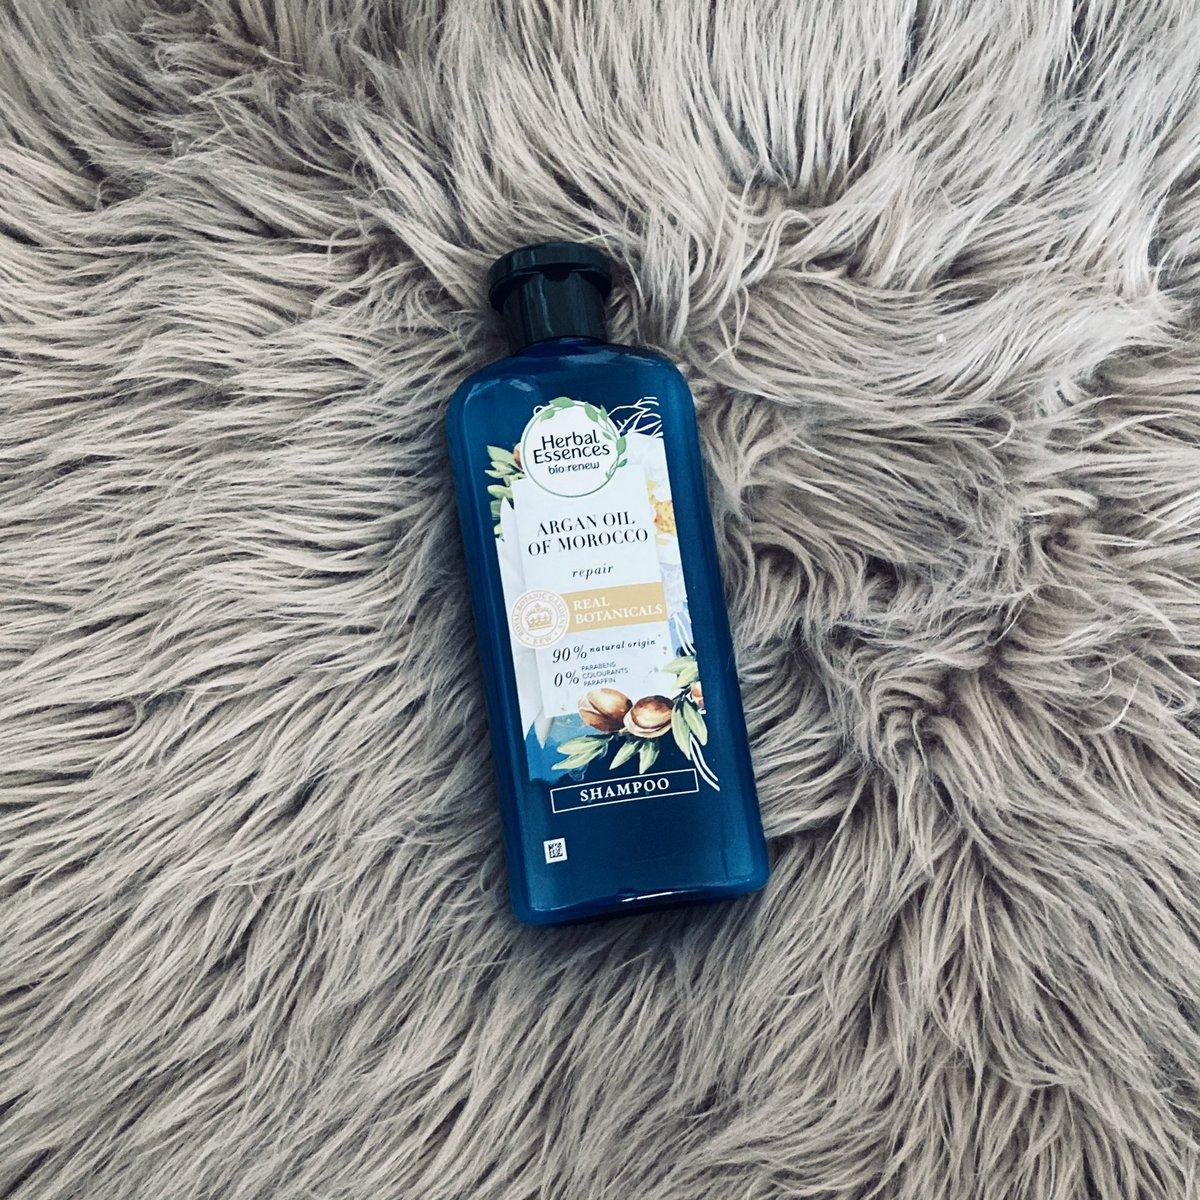 Shampoo smells like Harry Styles   #HarryStyles #harries #harriesloveloveloveharry #harry #styles #directioner #hazzastyles #hazza #WatermelonSugar #fineline #shampoo